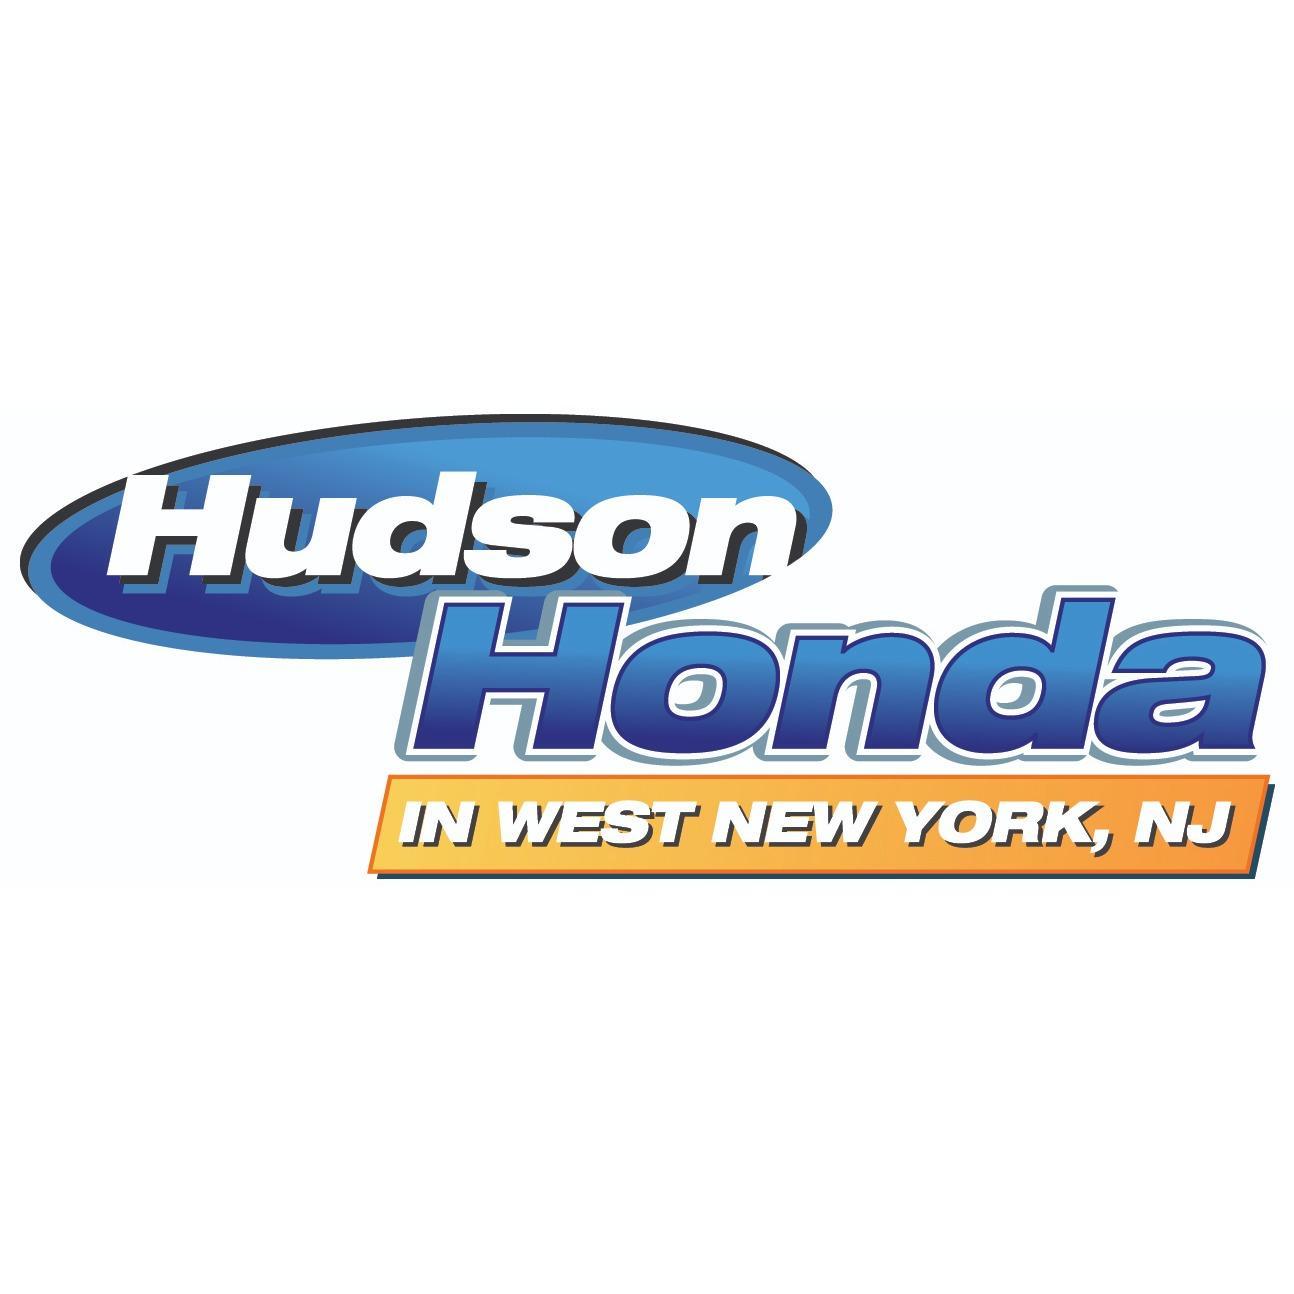 Hudson Honda Service & Parts image 3